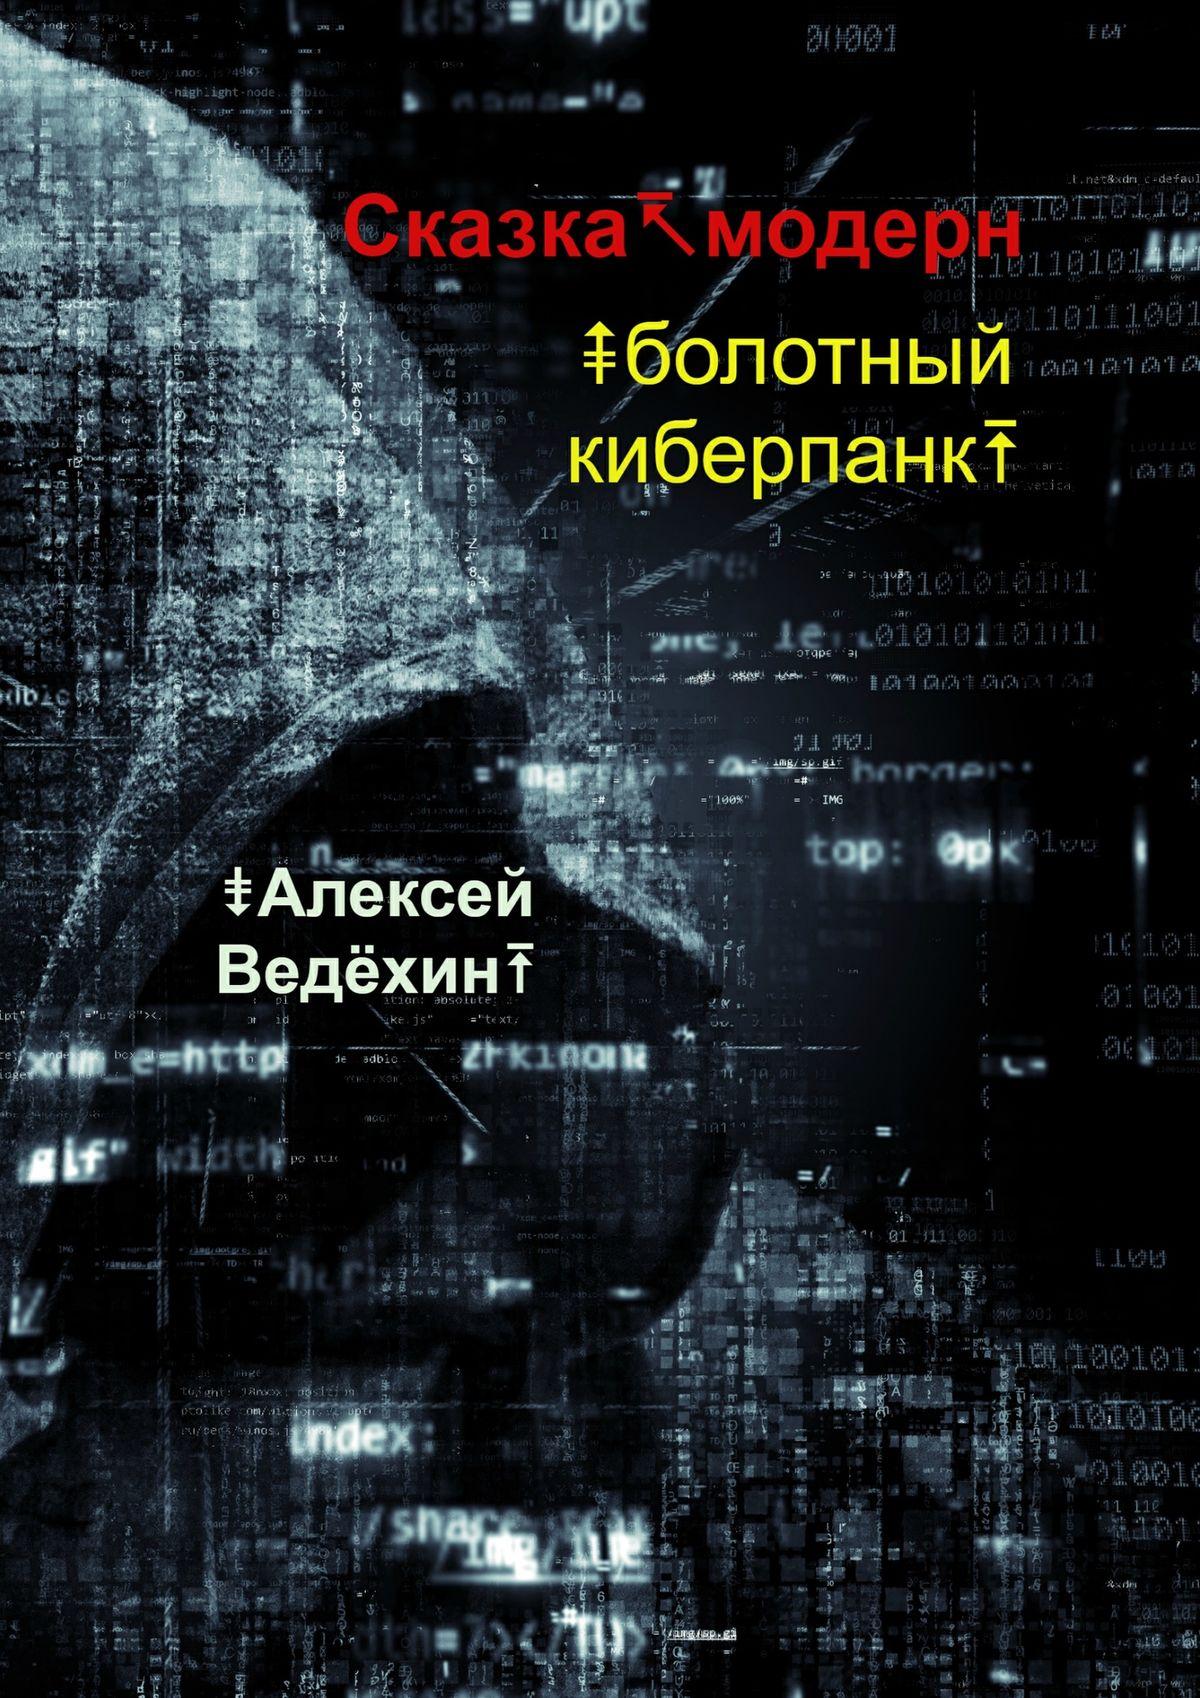 Алексей Ведёхин Сказка-модерн. Болотный киберпанк компьютер